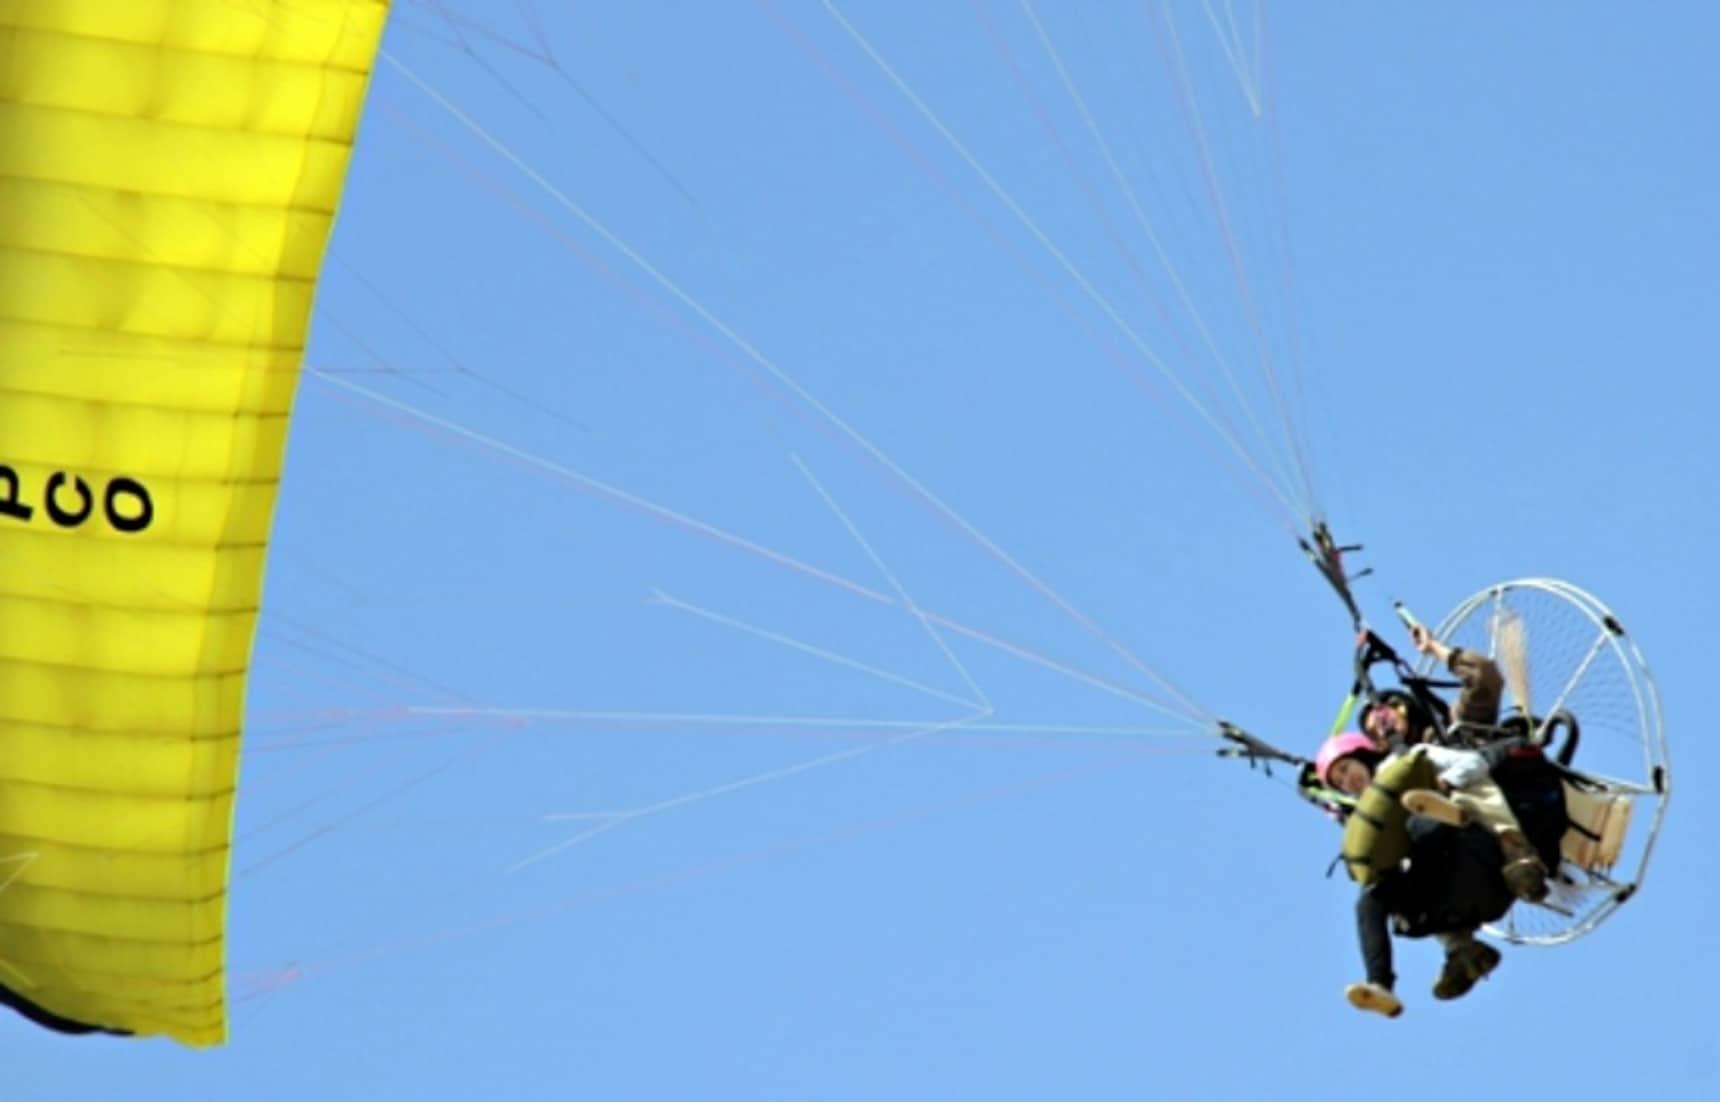 Take off on a Fun Tandem Paraglider Flight